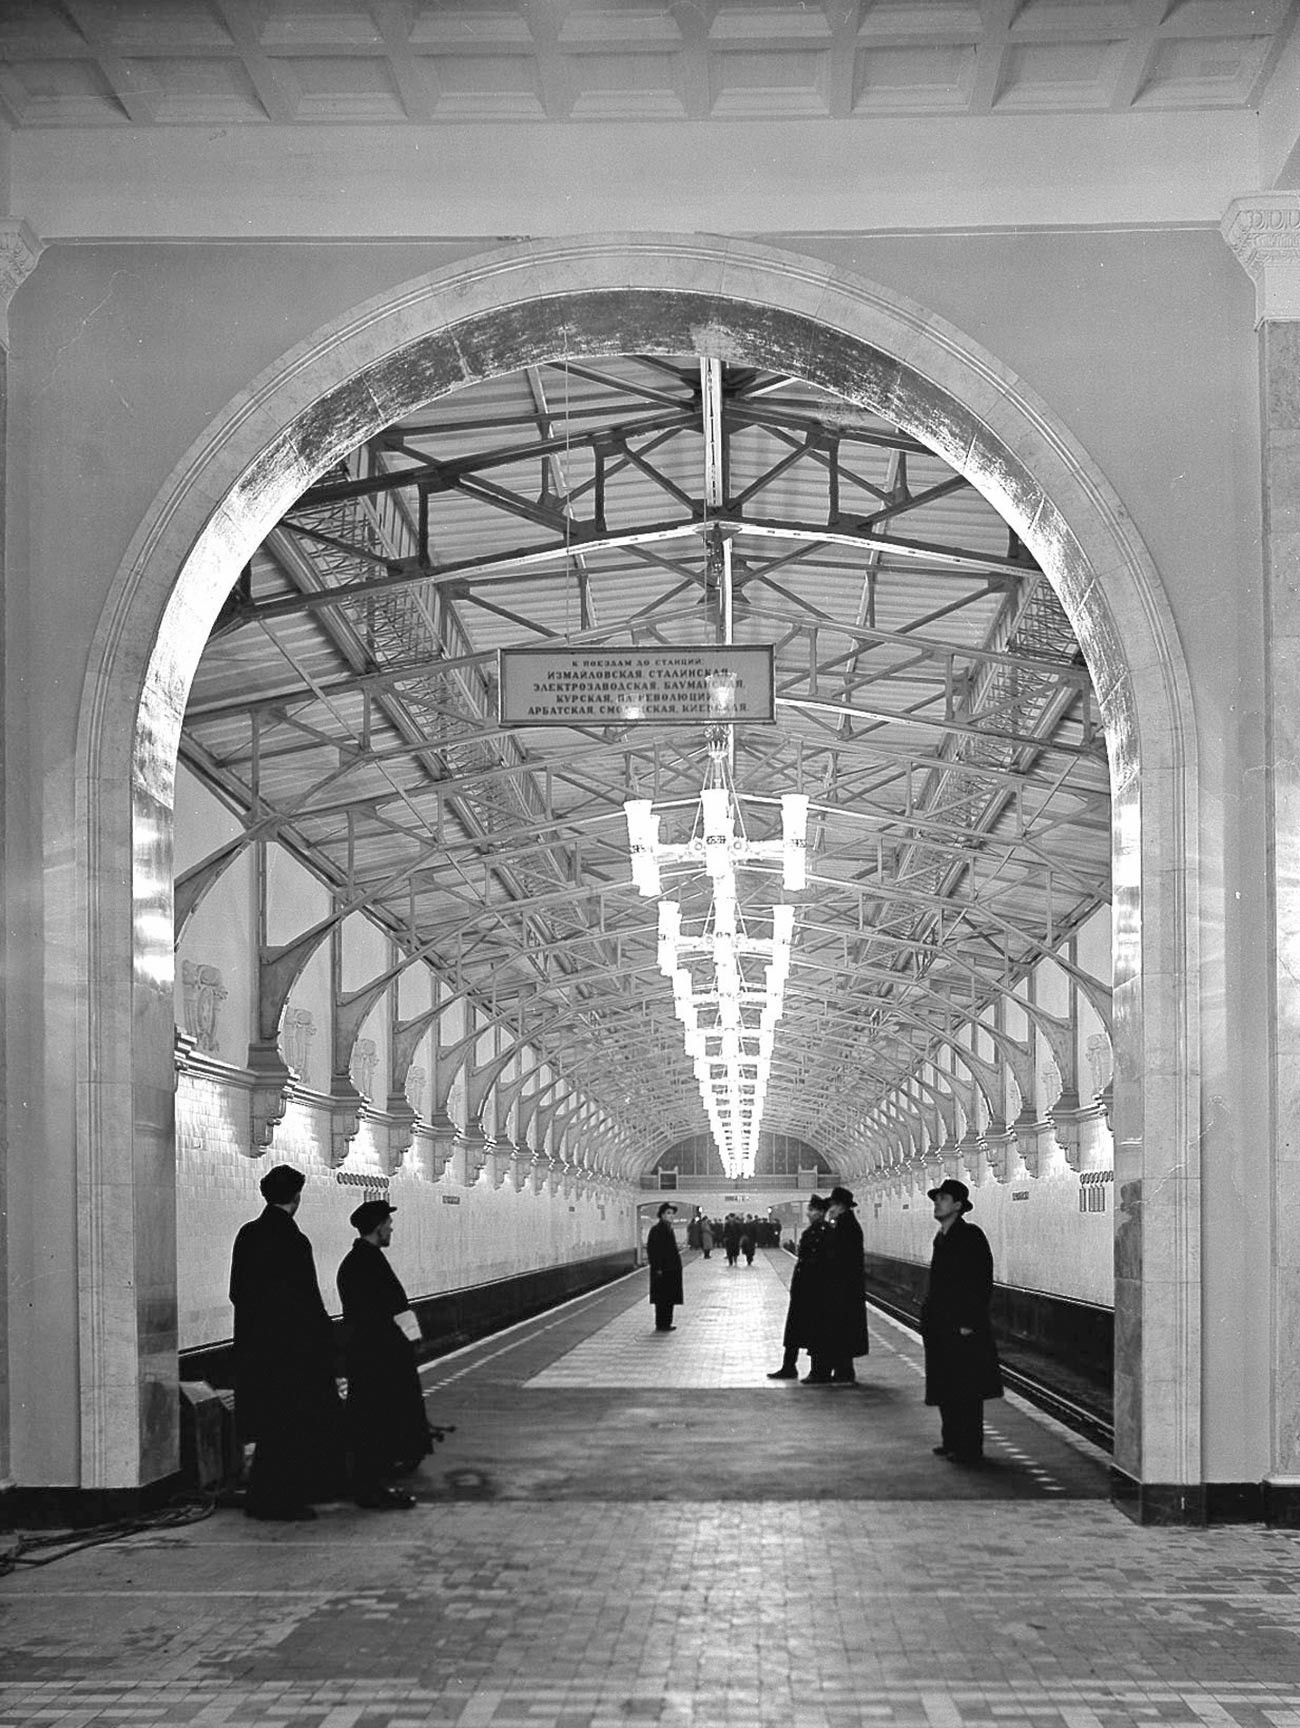 Peron Stasiun Pervomayskaya yang lama, dilihat dari pintu masuk.